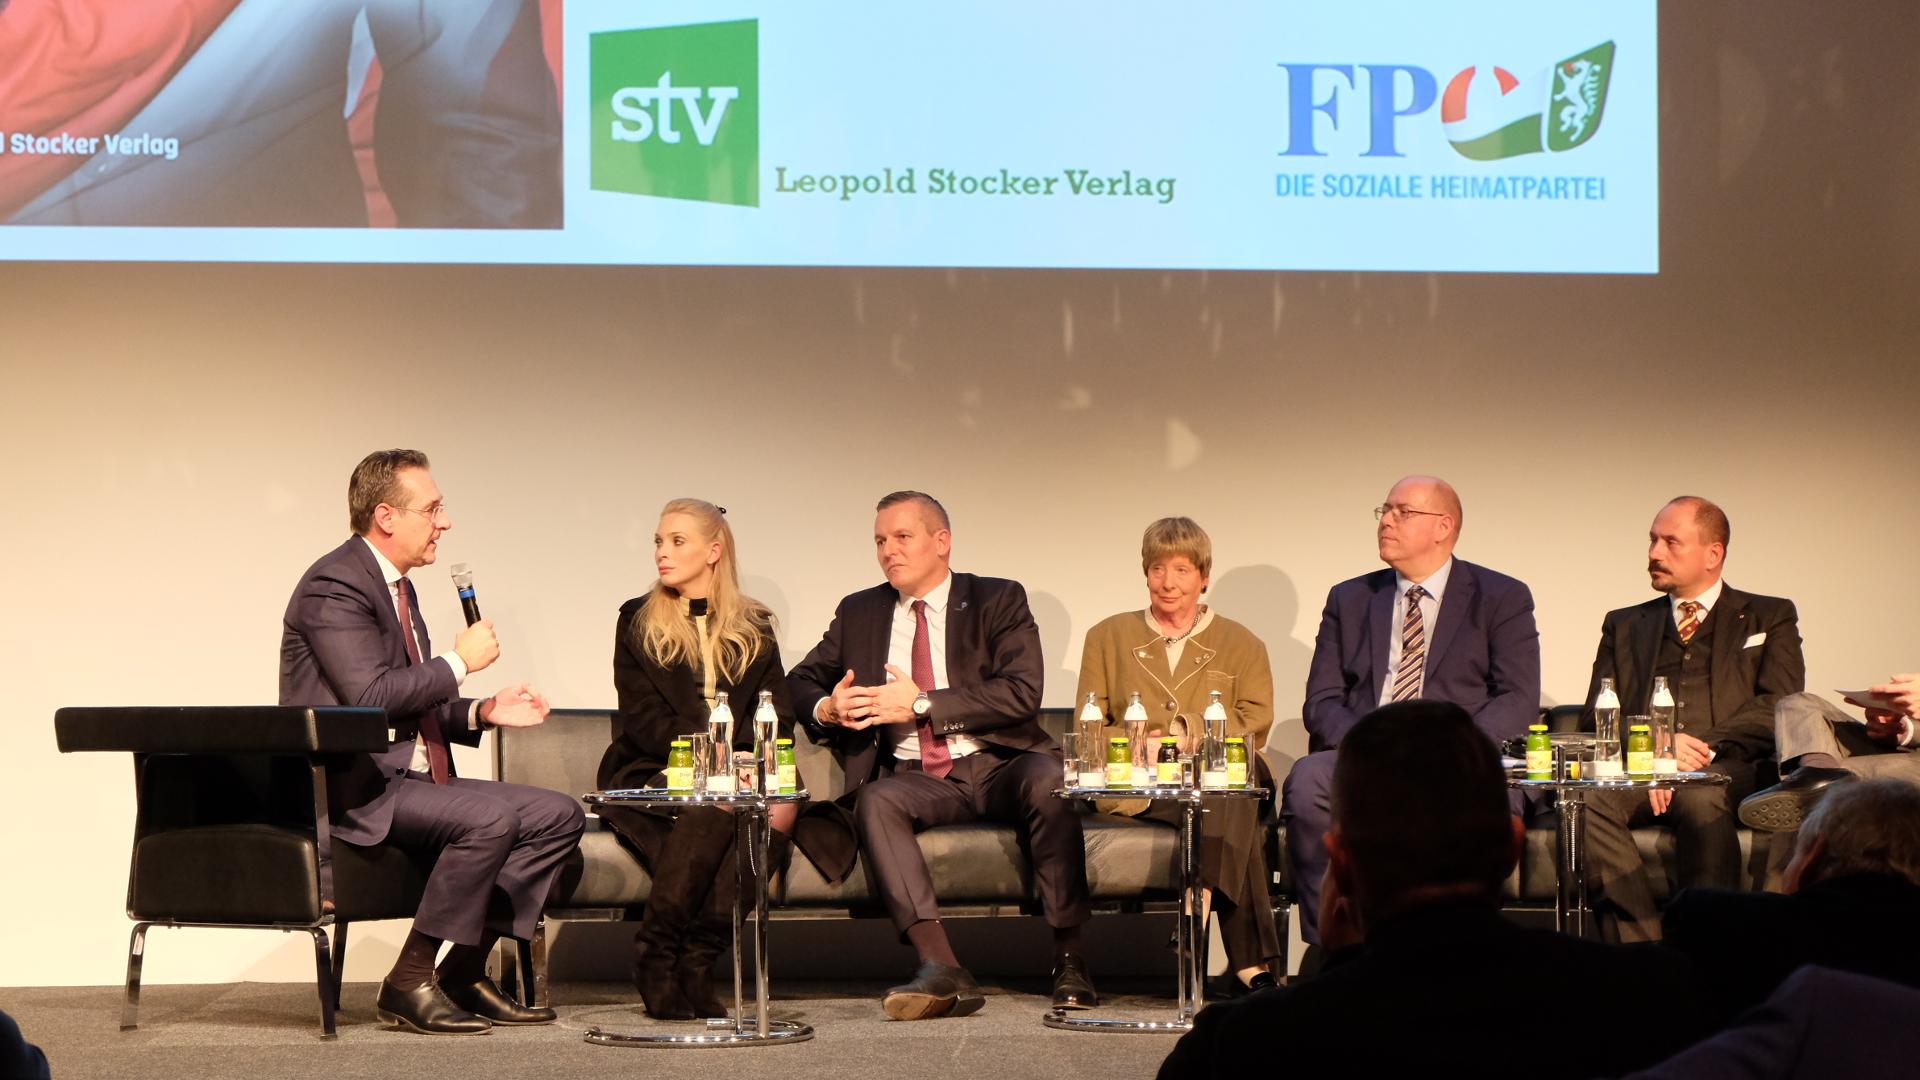 HC Strache-Philippa Strache, Mario Kunasek, Ursula Stenzel. Martin Hobek, Wolfgang Dvorak-Stocker